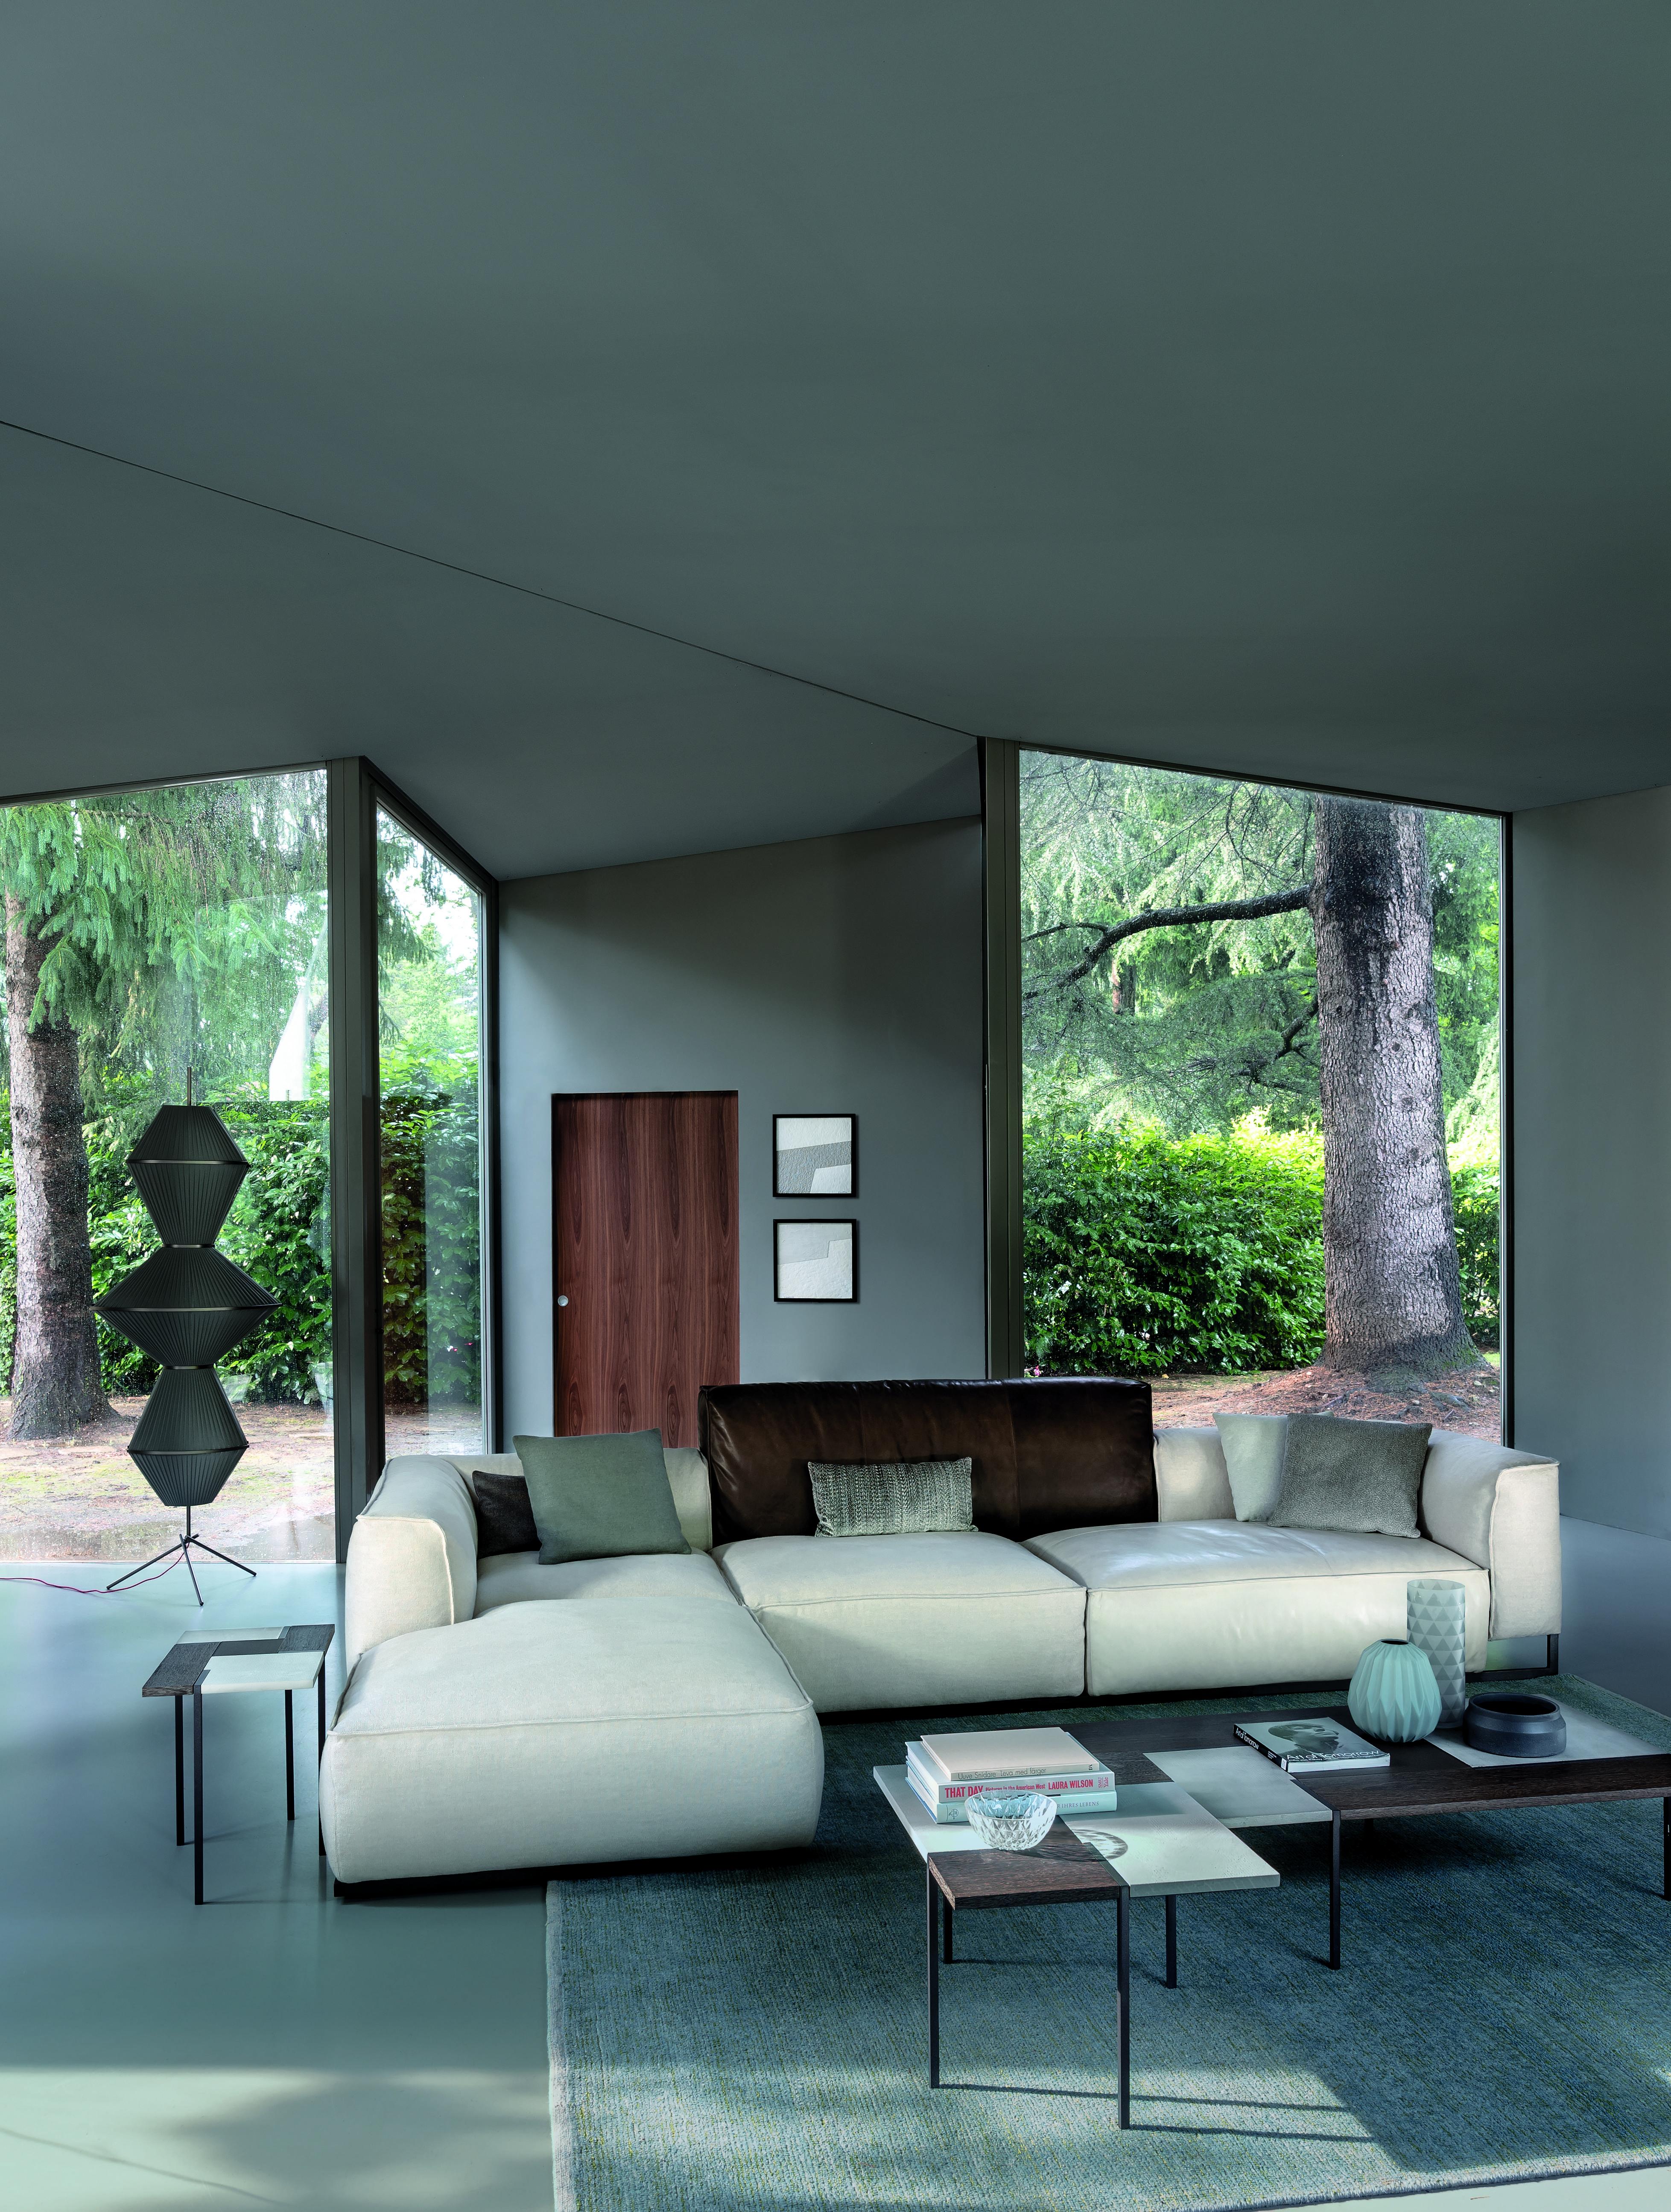 Arketipo Sofa Inkas Designermobel Von Raum Form Nurnberg Modernes Mobeldesign Sofa Design Mobeldesign